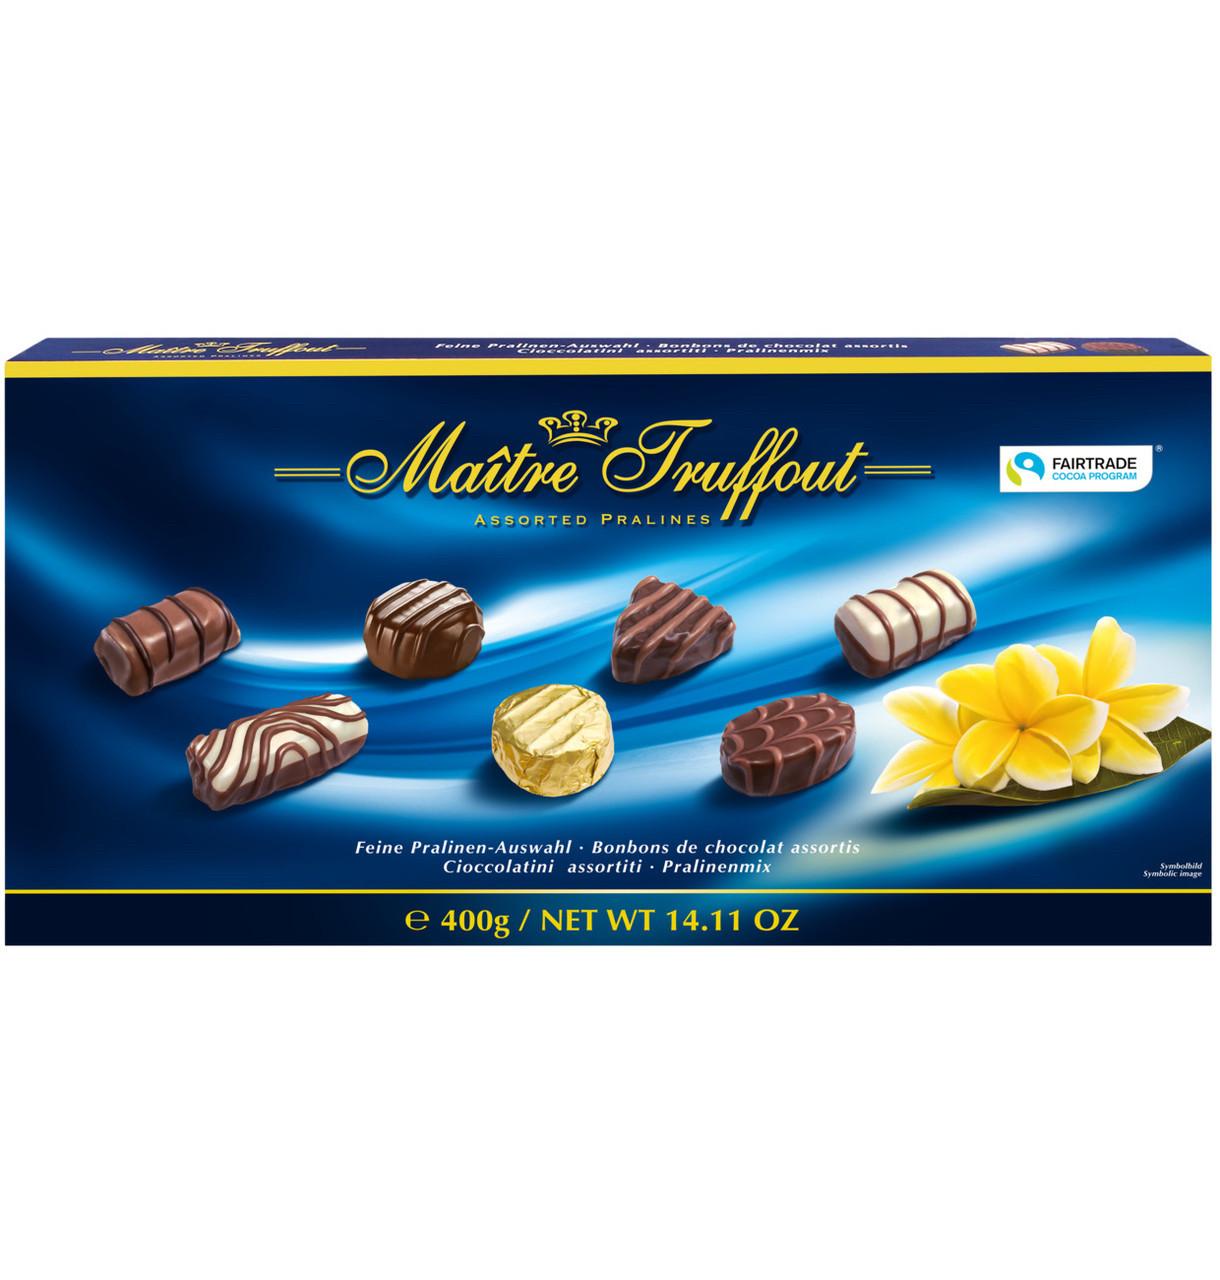 Цукерки  Maitre Truffout, асорті праліне сині, 400г